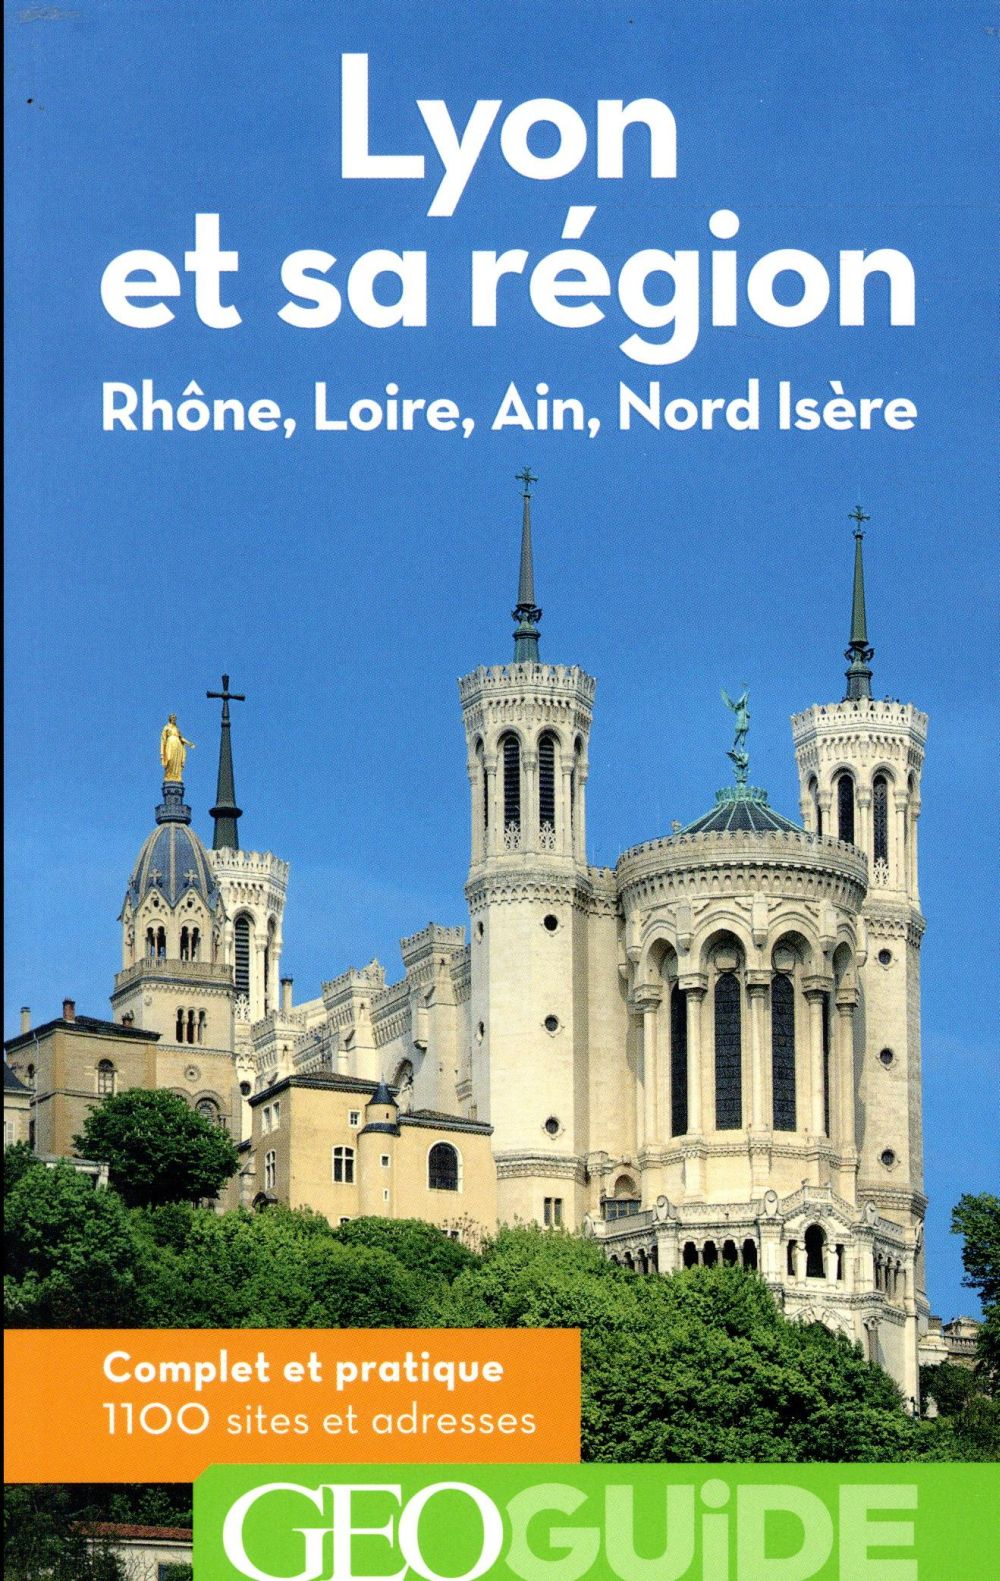 GEOguide ; Lyon et sa région